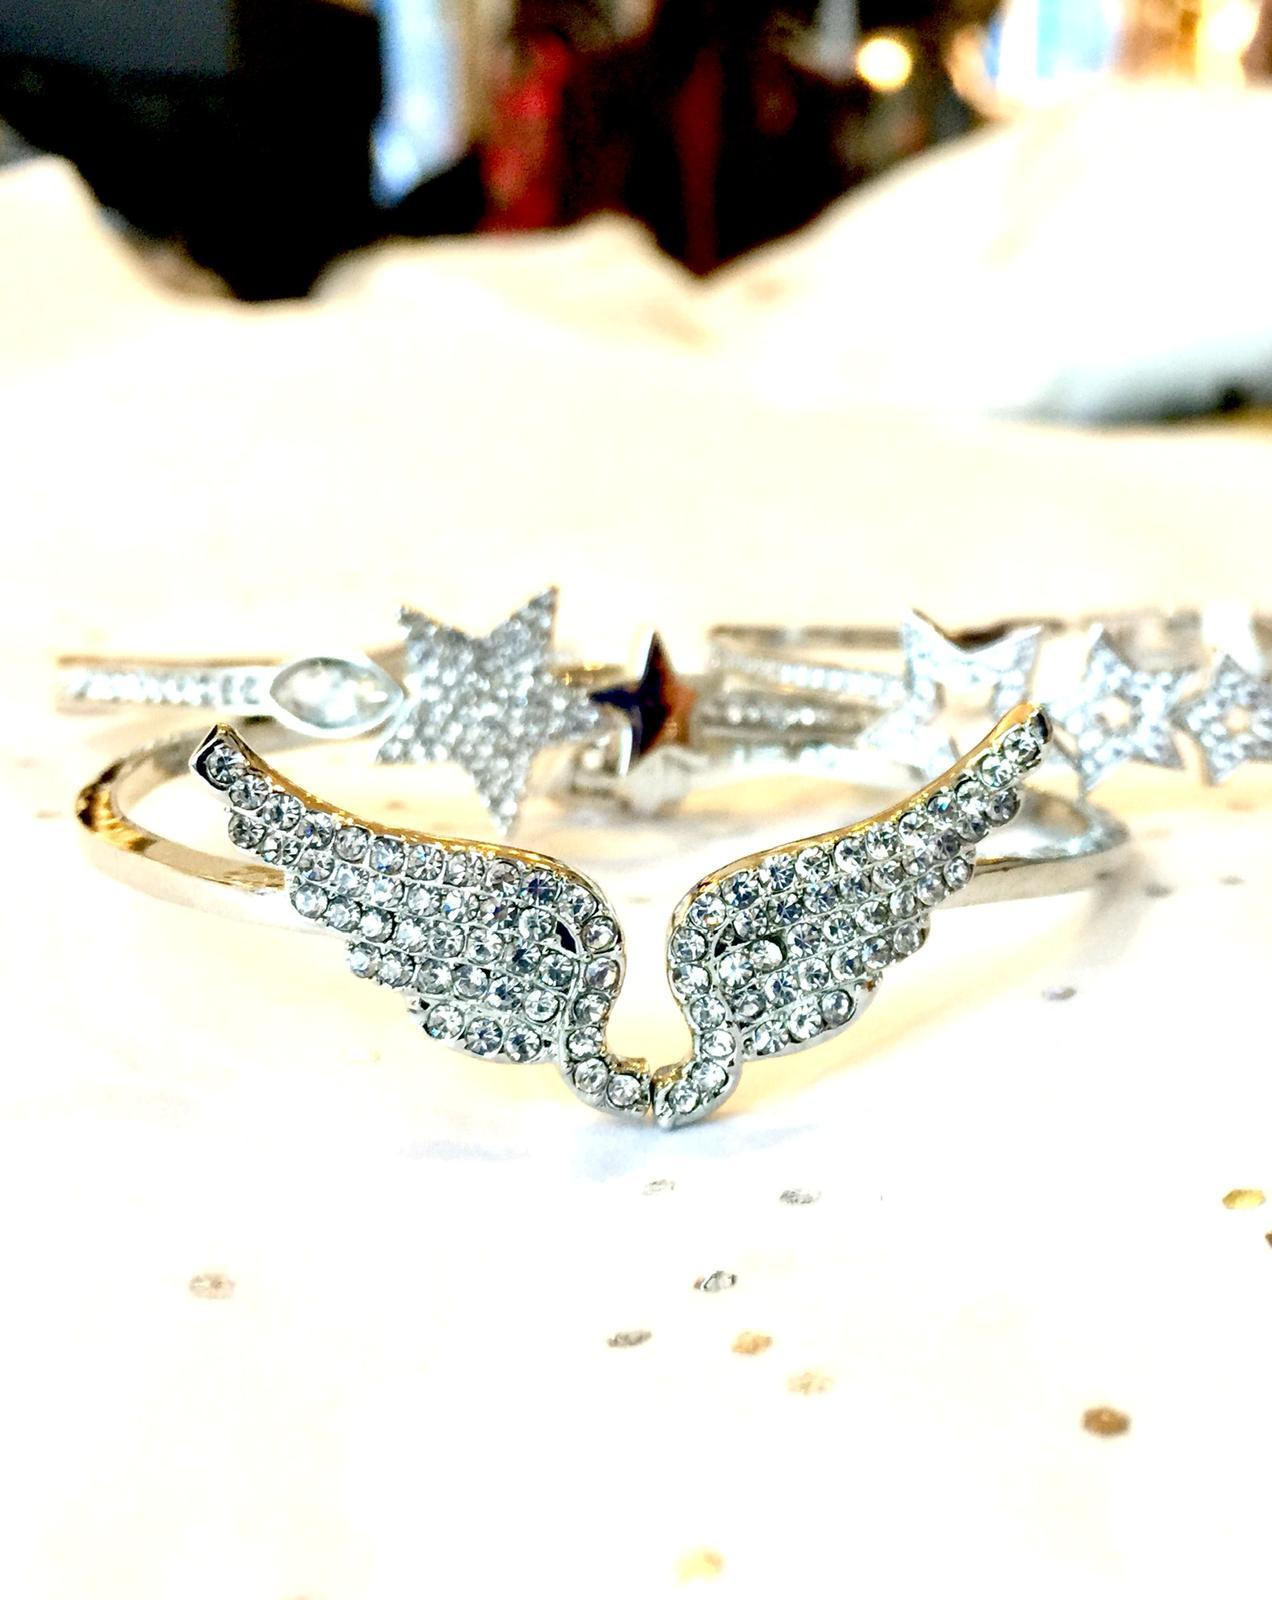 An angel brooch